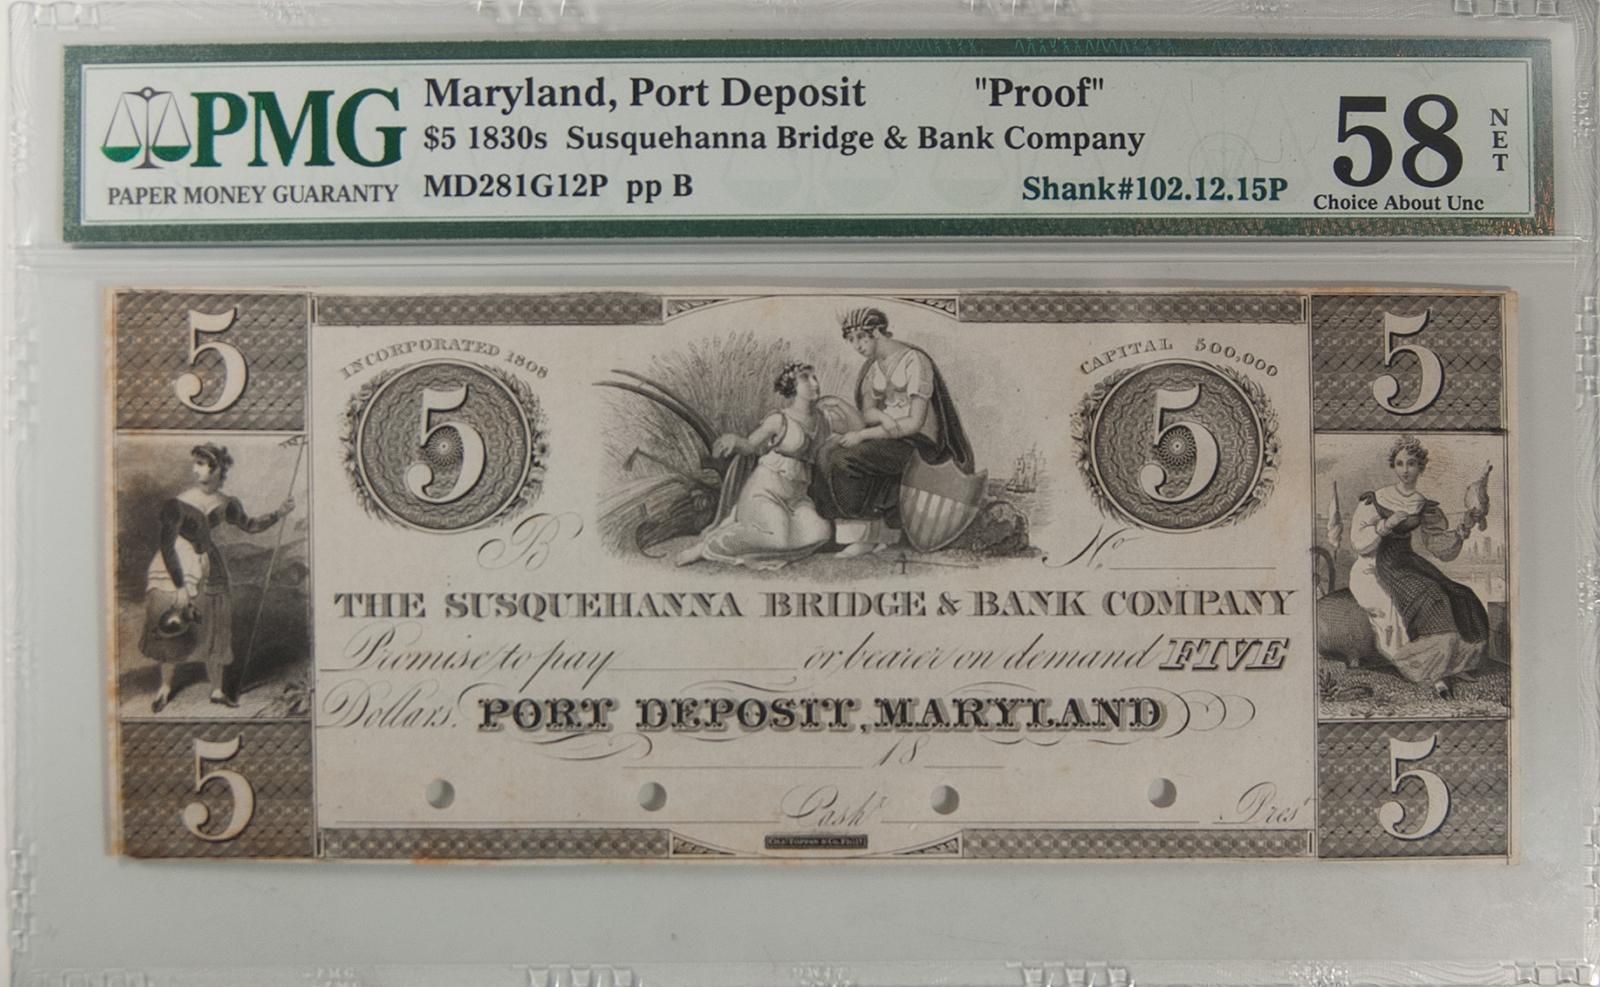 U.S. Currency 1830S PORT DEPOSIT, MD $5.00 SUSQUEHANNA BRIDGE & BANK COMPANY PMG CH AU-58 NET